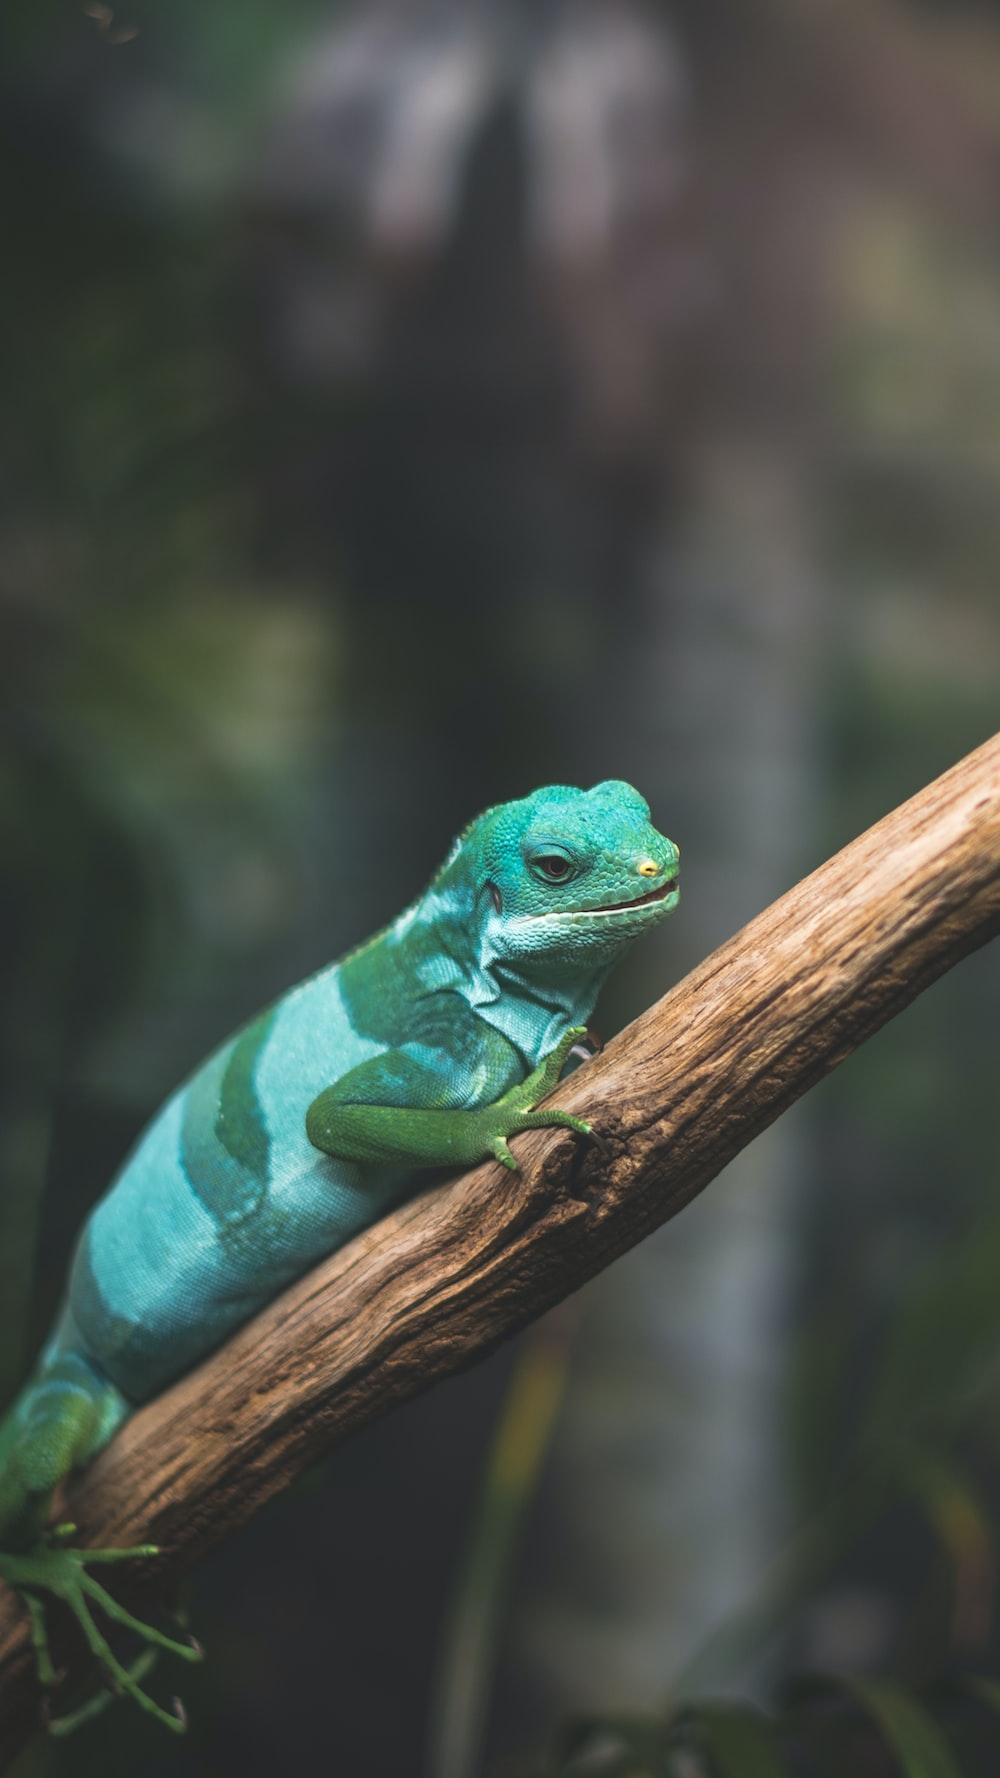 green lizard crawling on tree branch